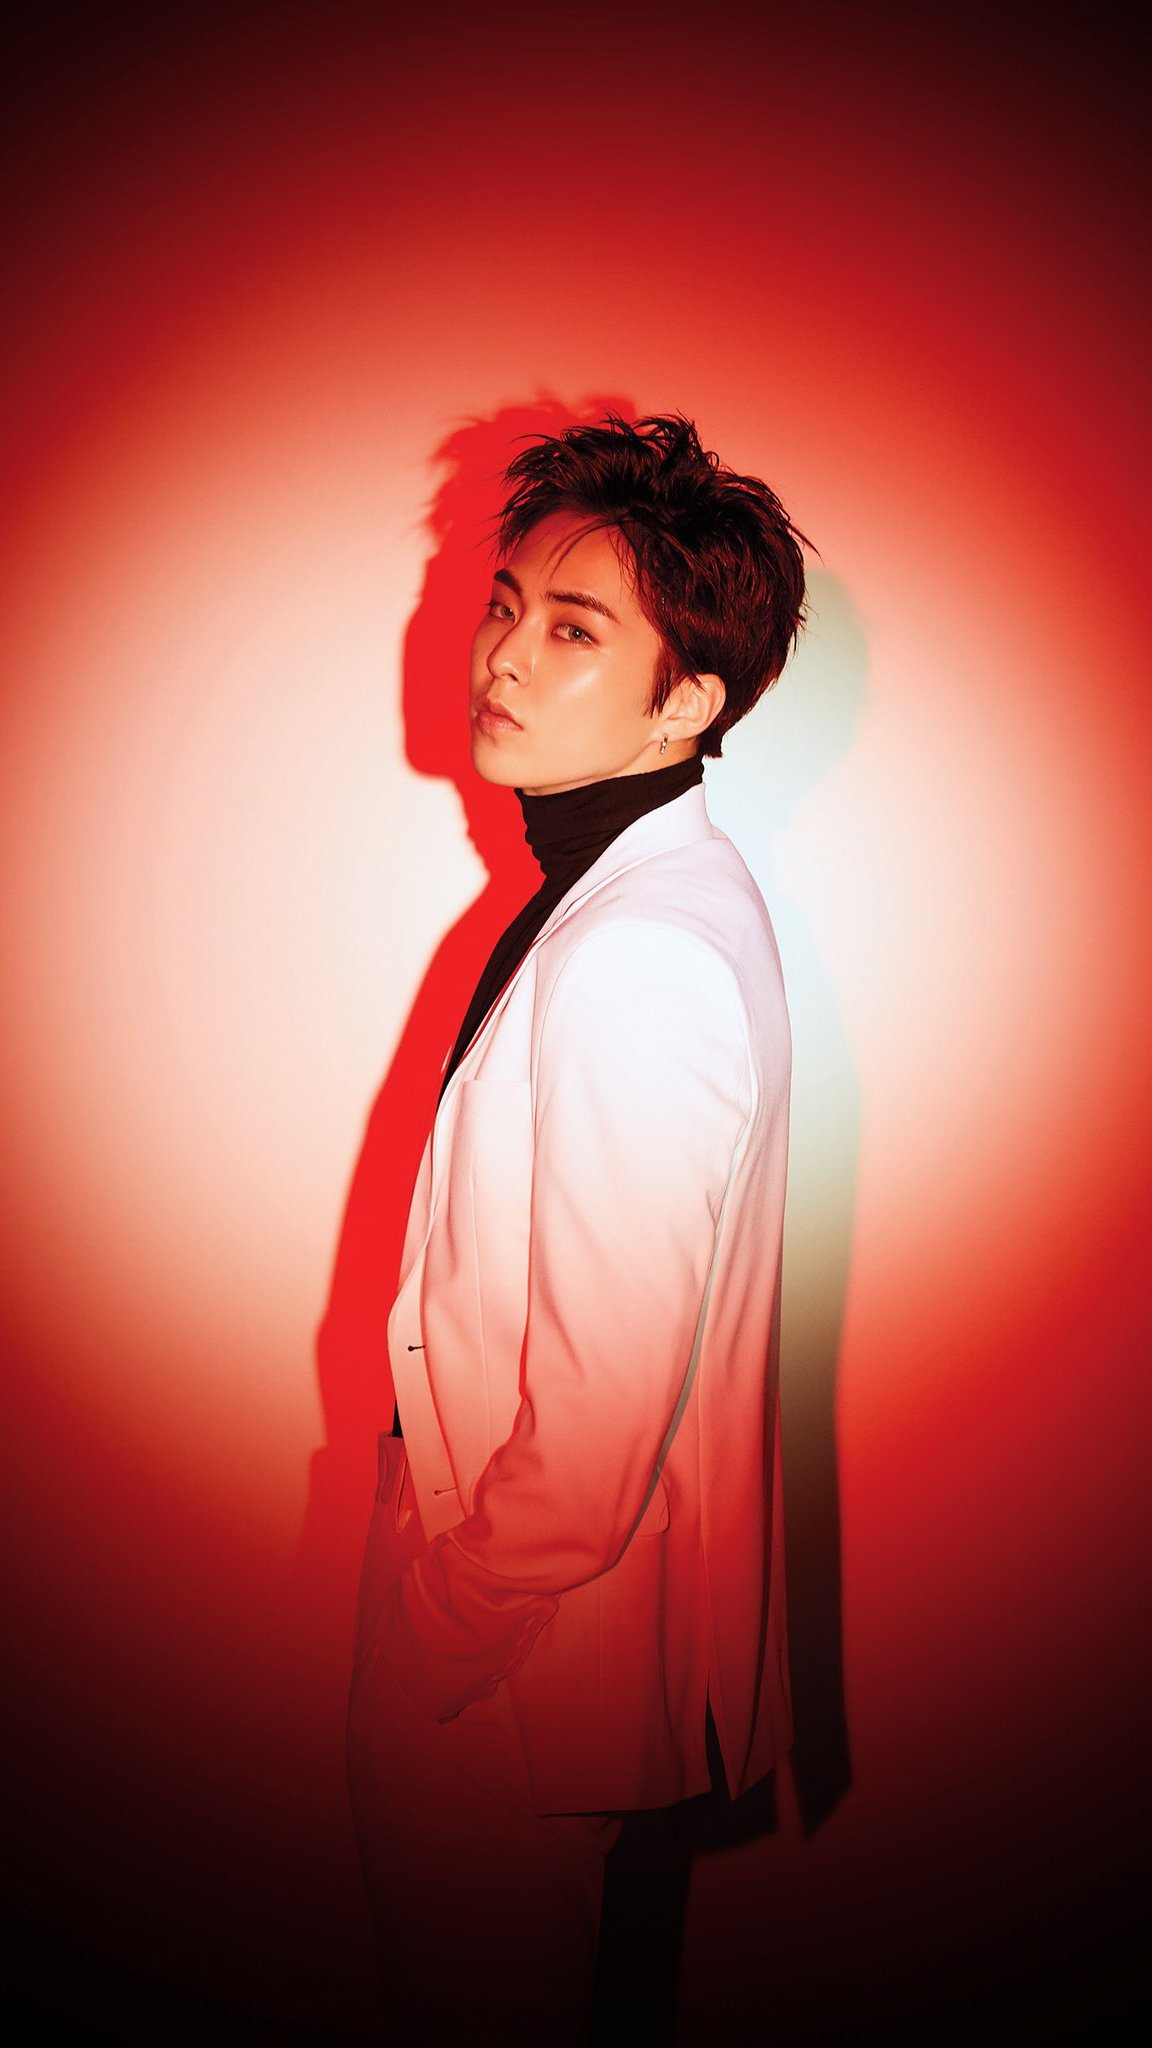 K Wallpaper Gif On Twitter Loveshot Exo Hd Wallpaper Lock Screen Xiumin Suho D O Kai